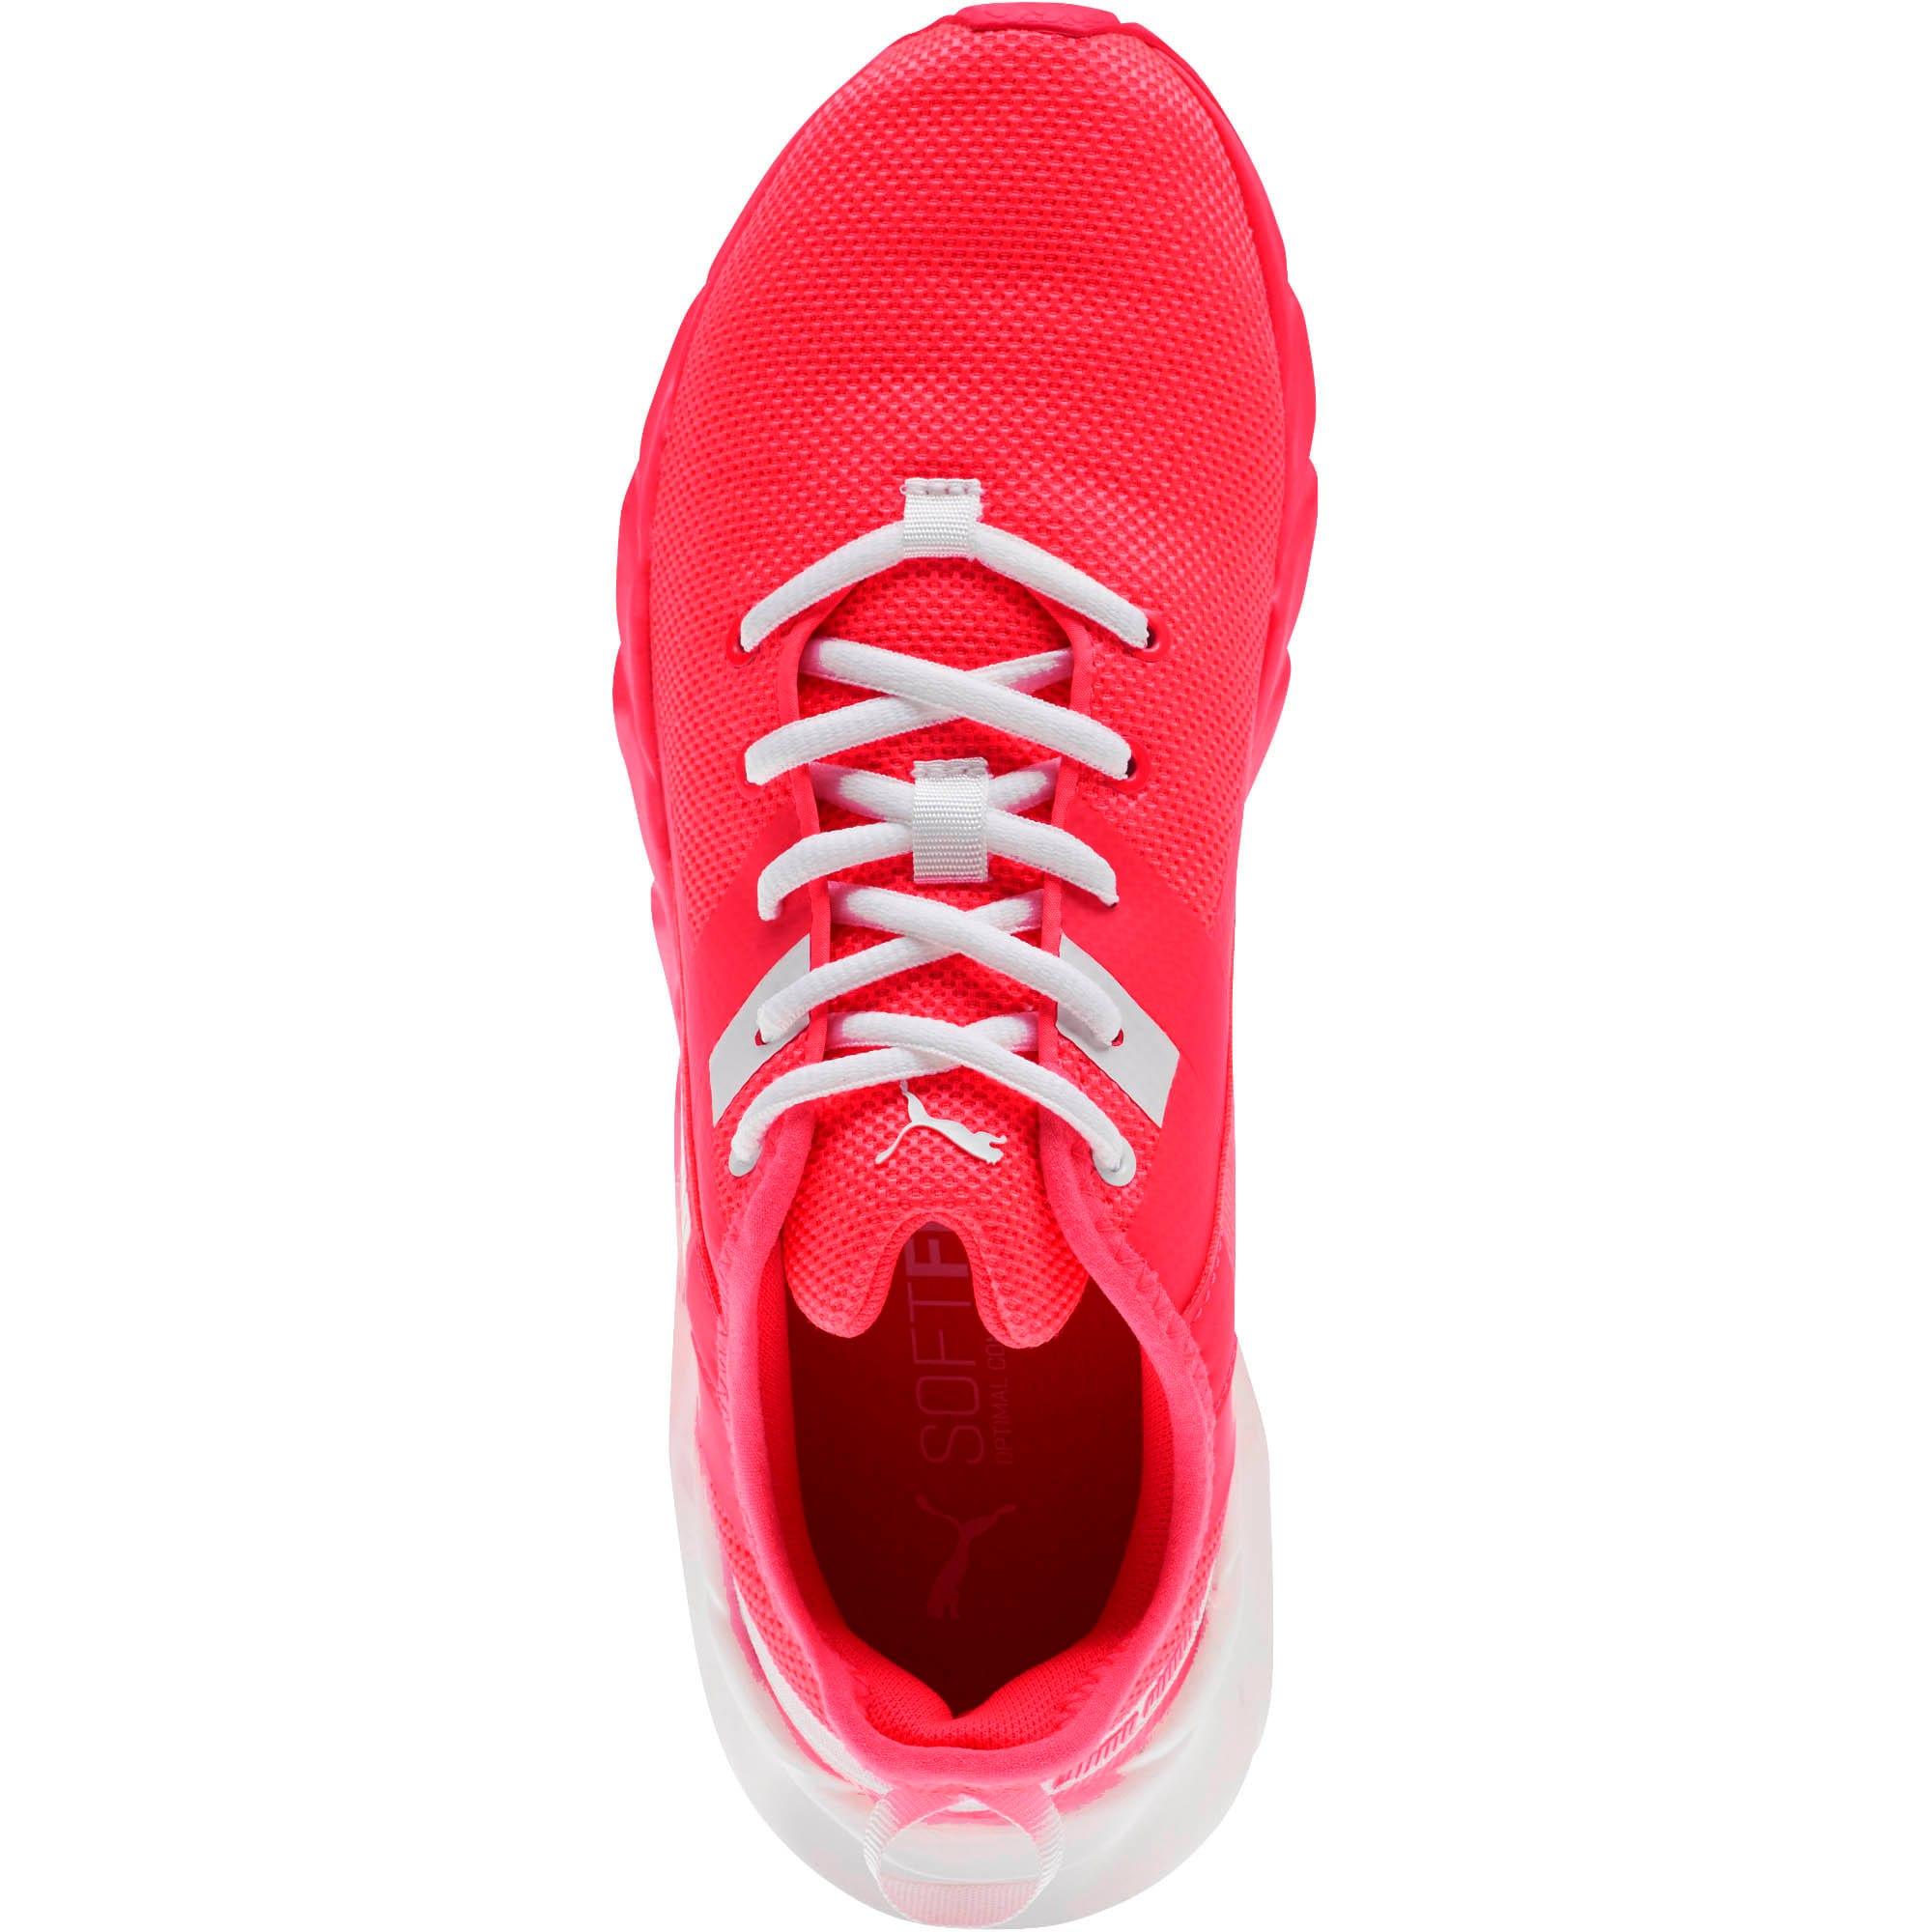 Thumbnail 5 of Weave XT Fade Women's Training Shoes, Pink Alert-Puma White, medium